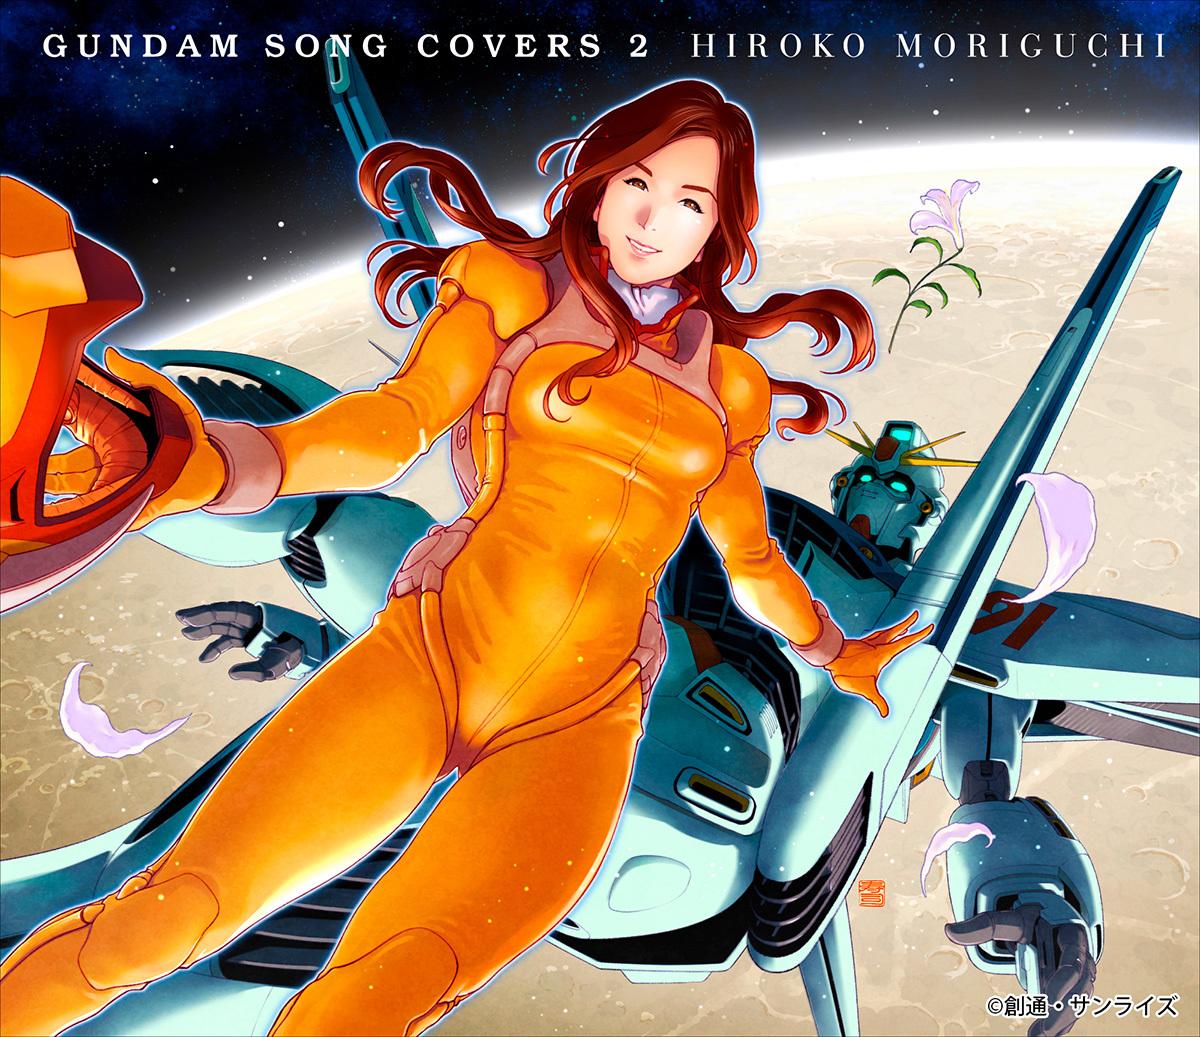 『GUNDAM SONG COVERS 2』